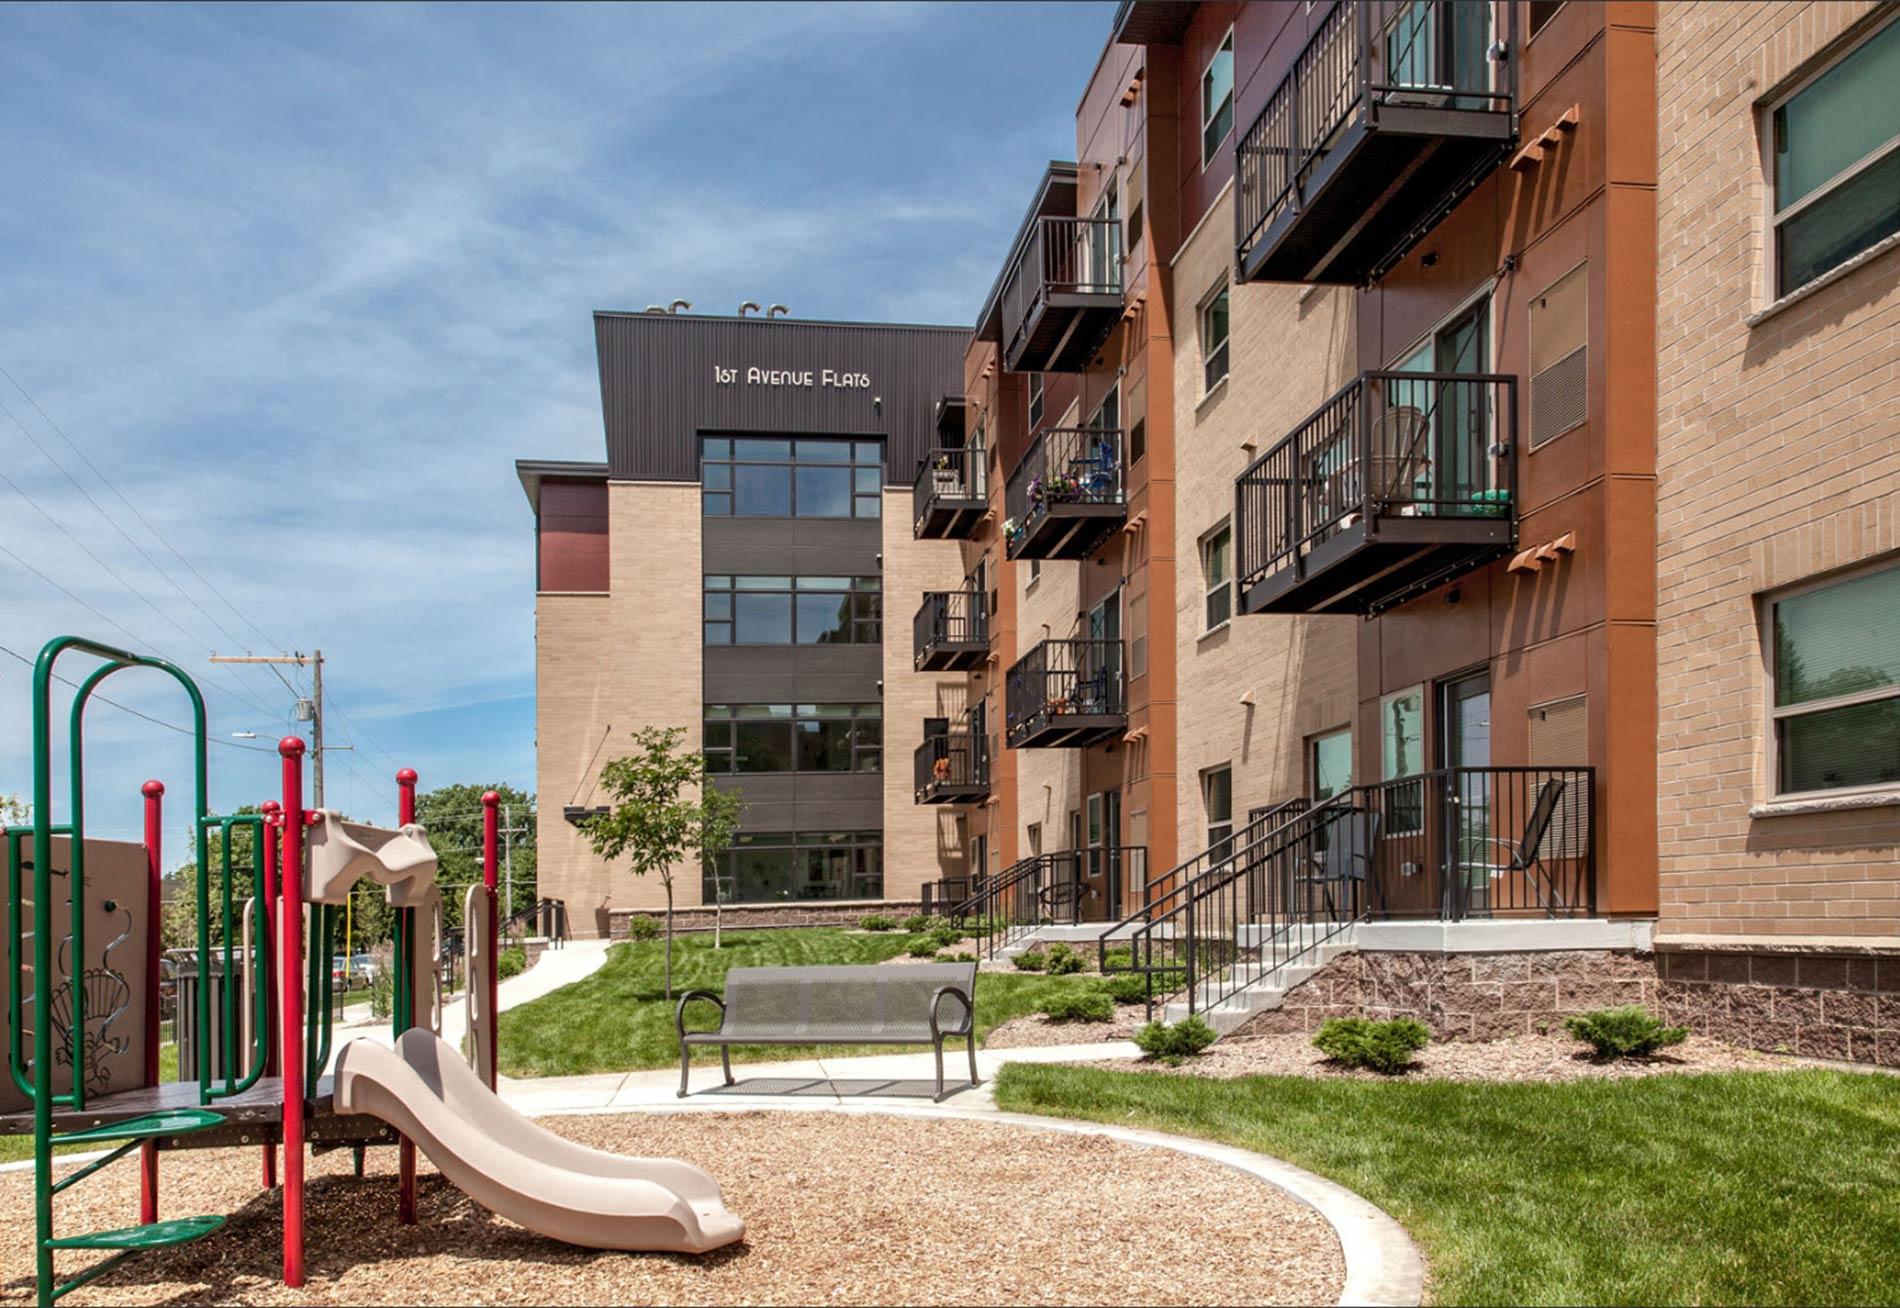 1st Avenue Flats Architectural Project